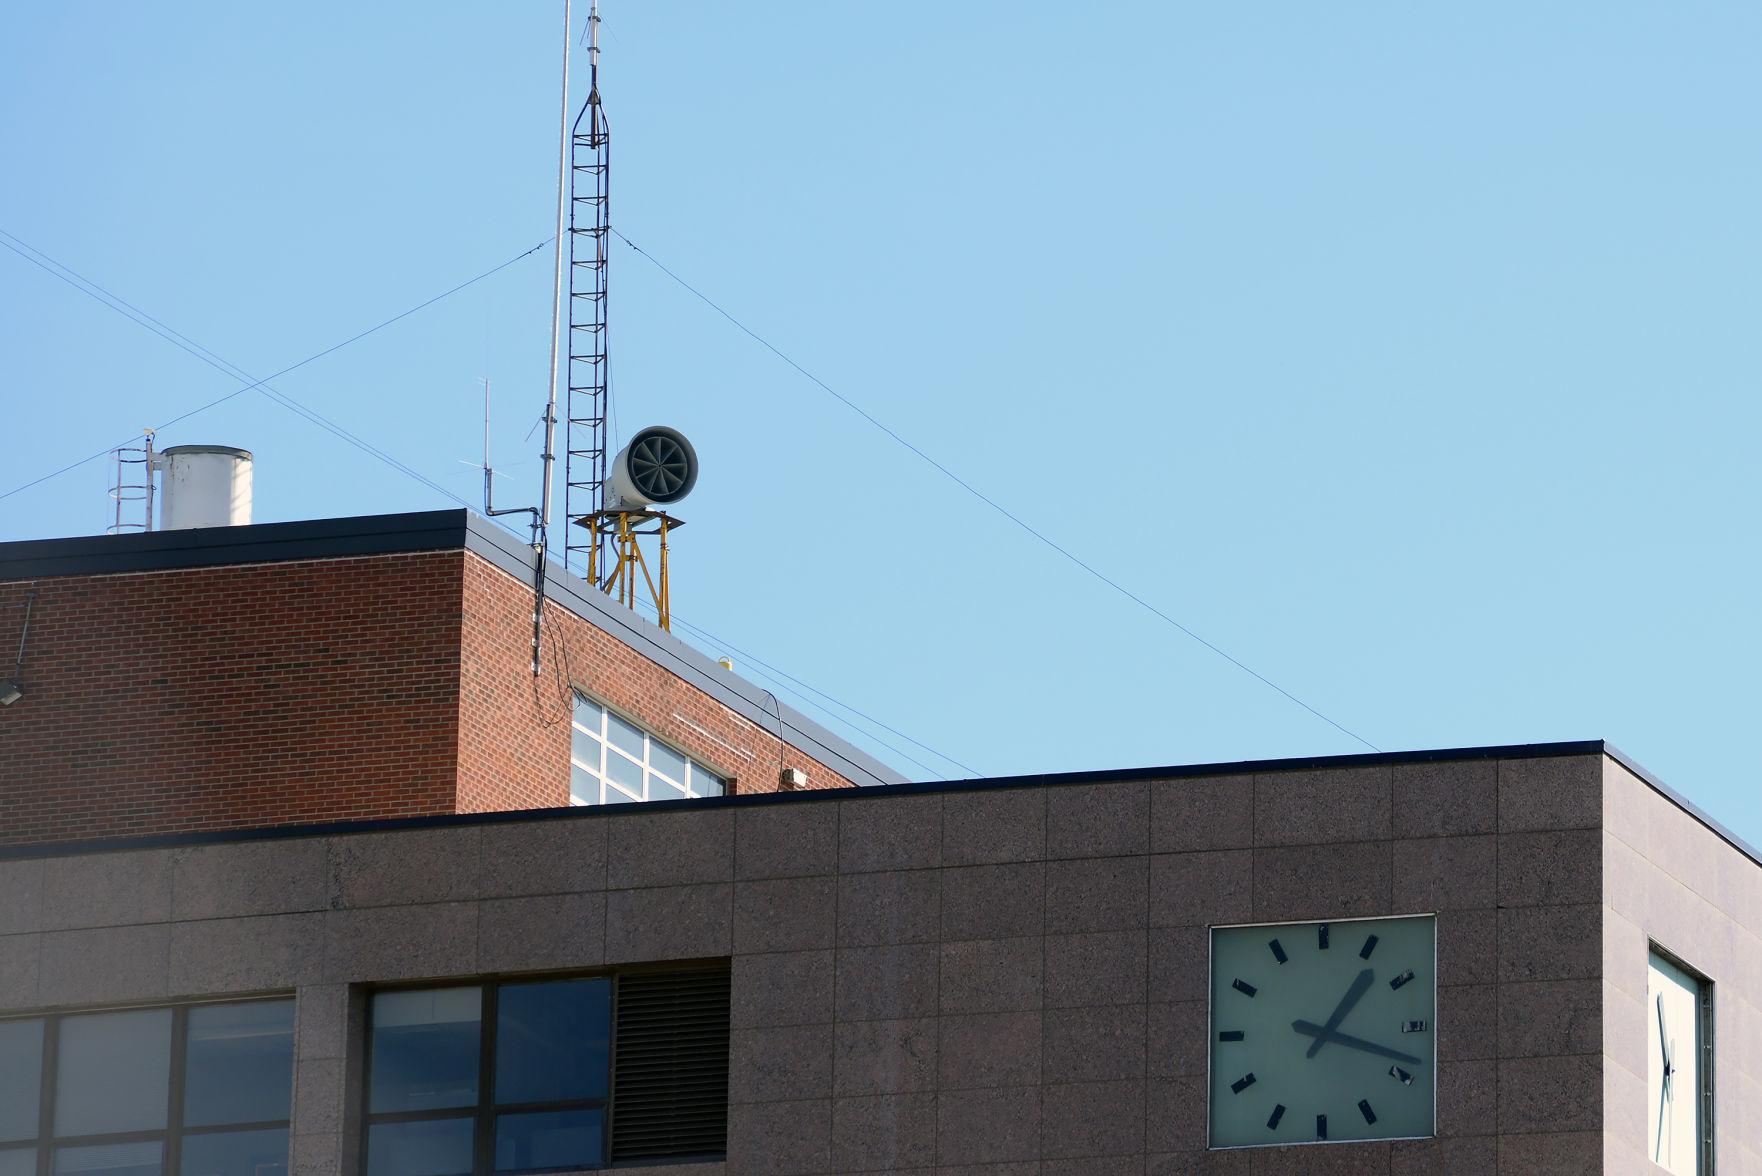 Yellowstone County to test sirens Wednesday | Billings Gazette